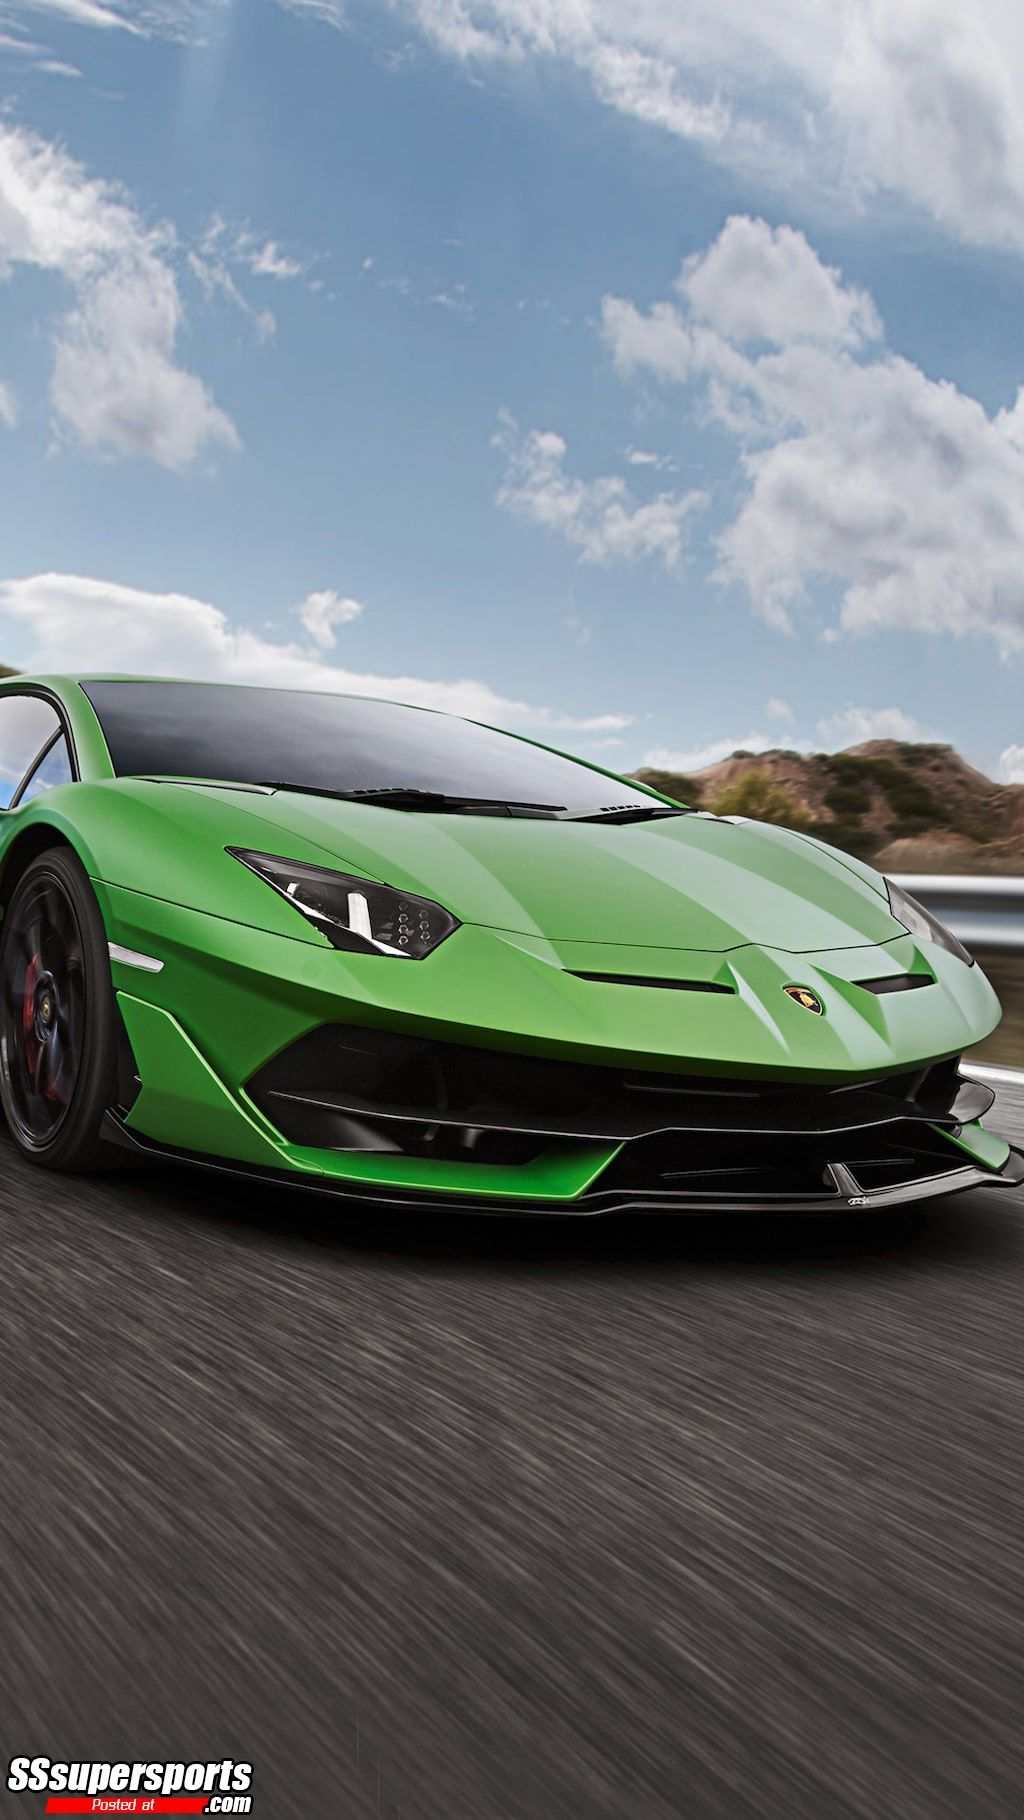 Aventador Svj Lamborghini Aventador Super Luxury Cars Lamborghini